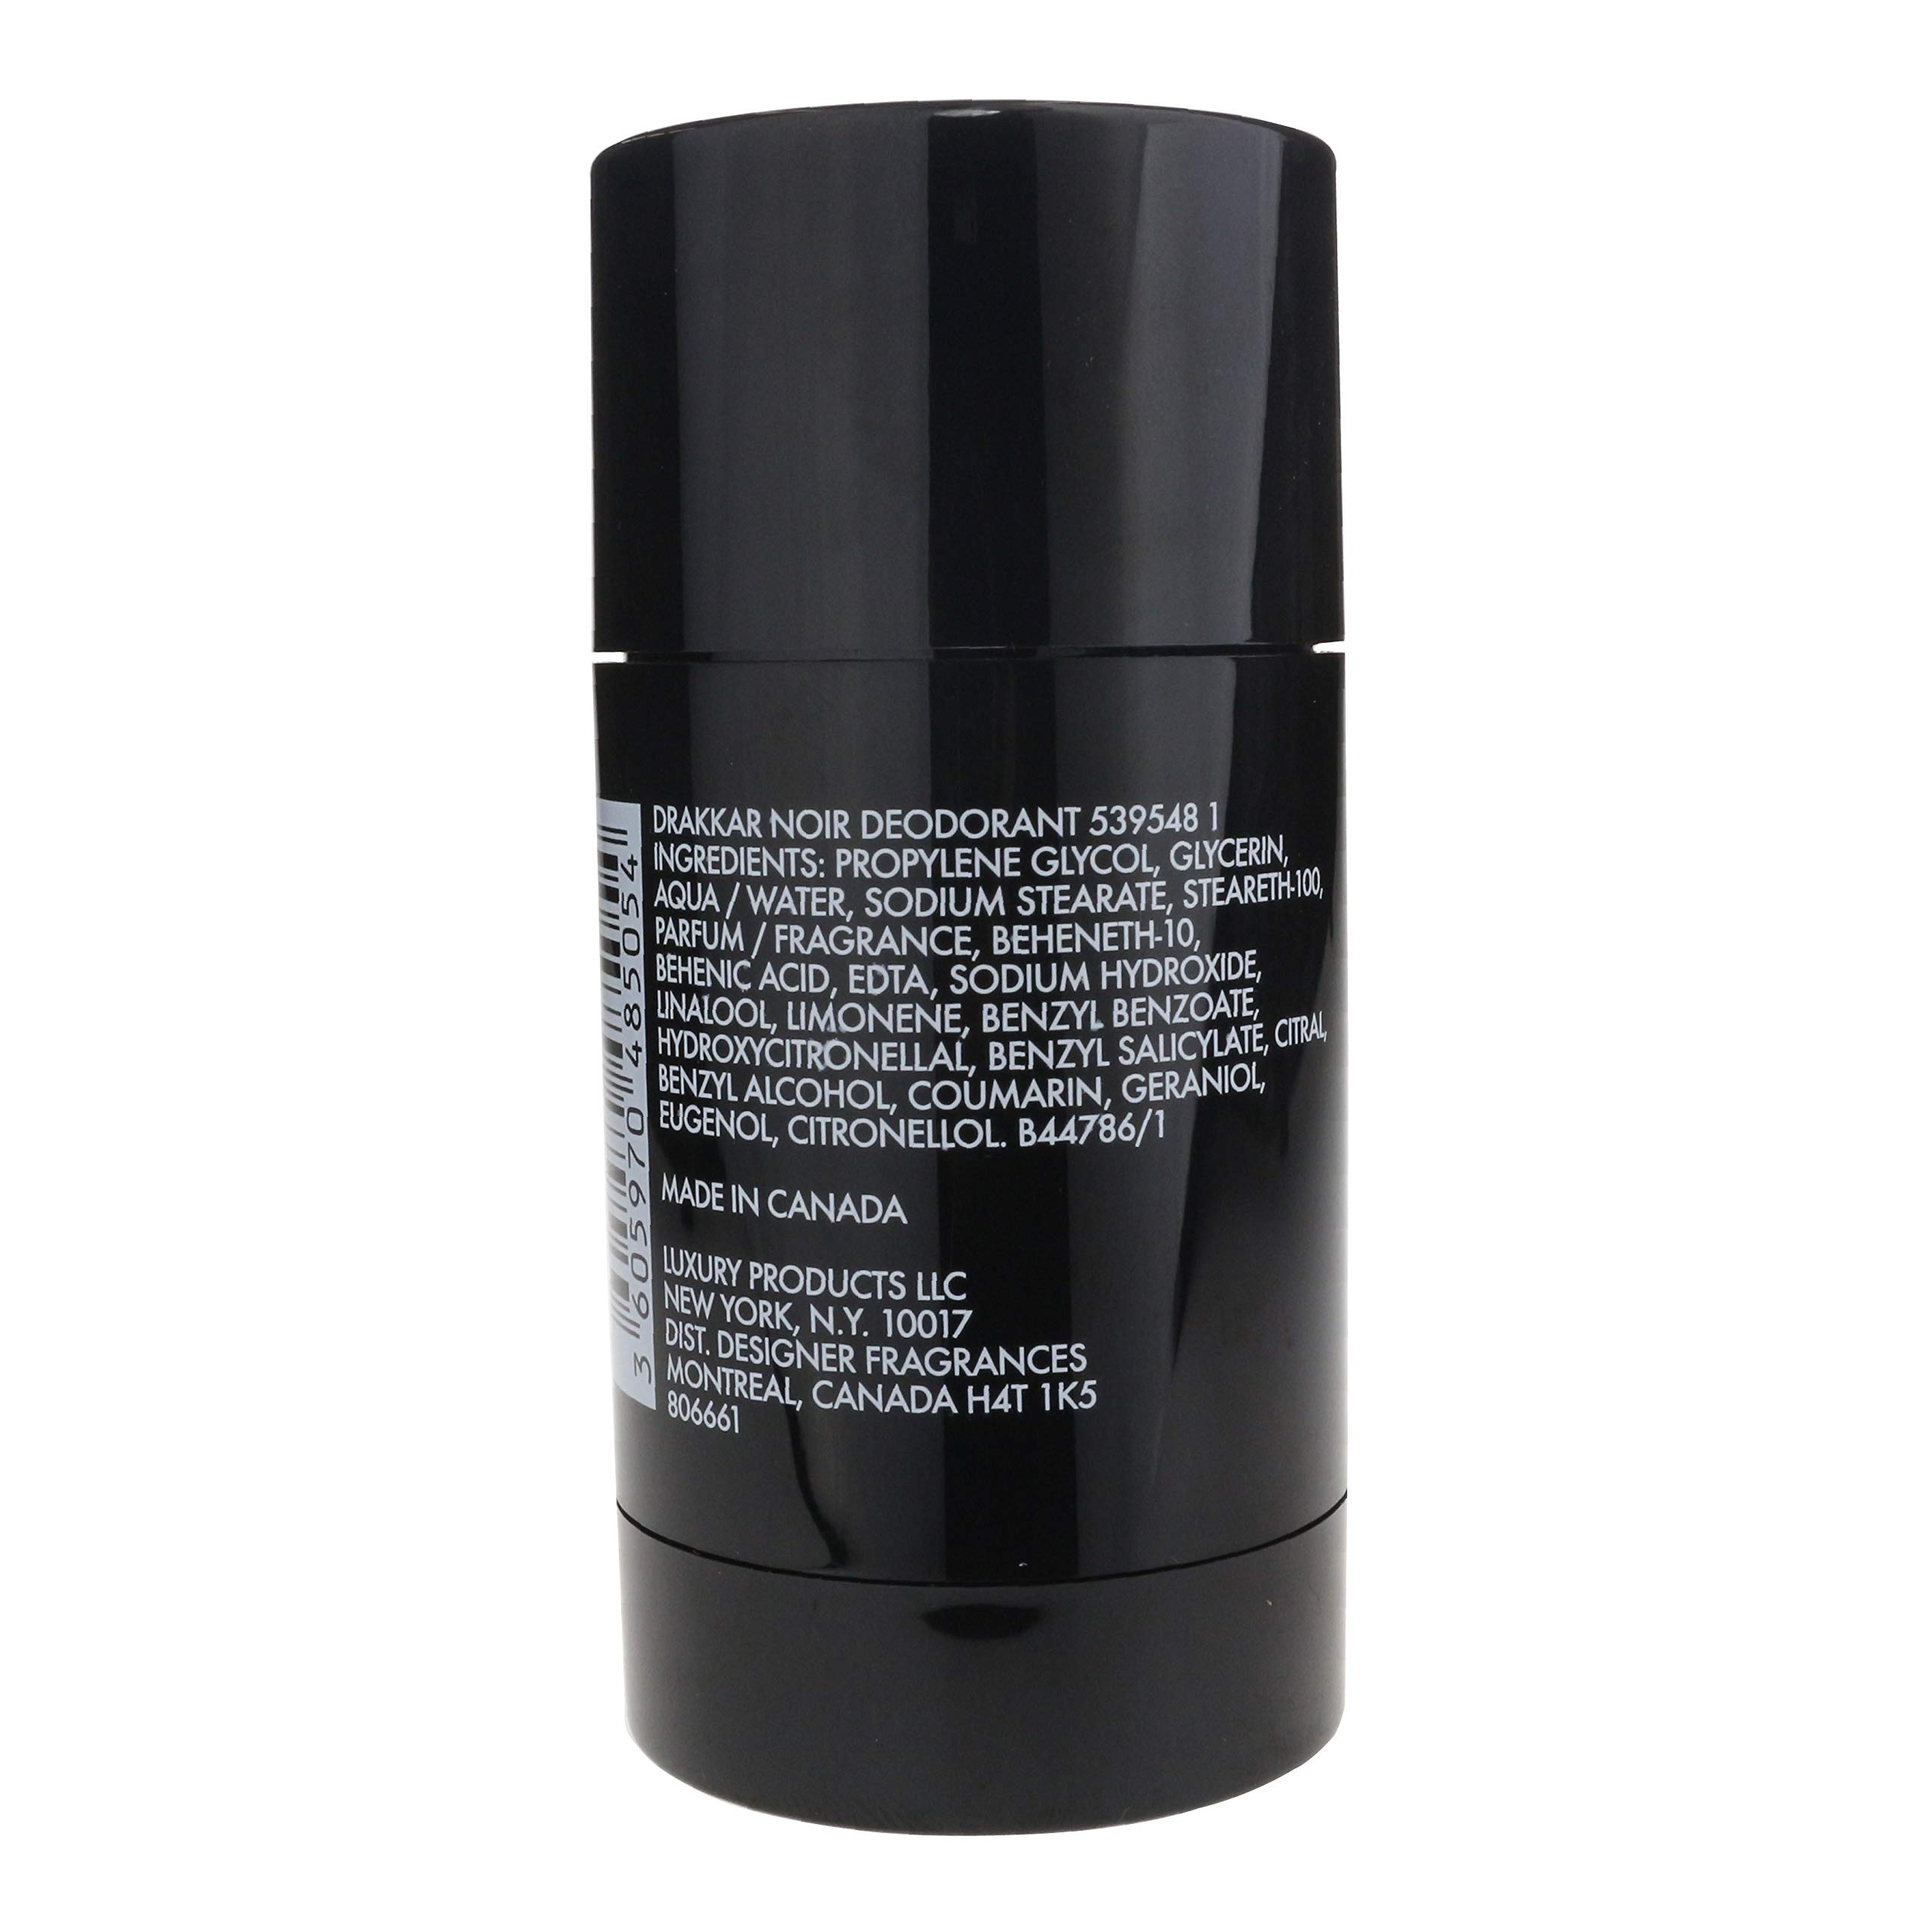 Guy Laroche Drakkar Noir Deodorant Body Spray 60 Fl Oz Designer